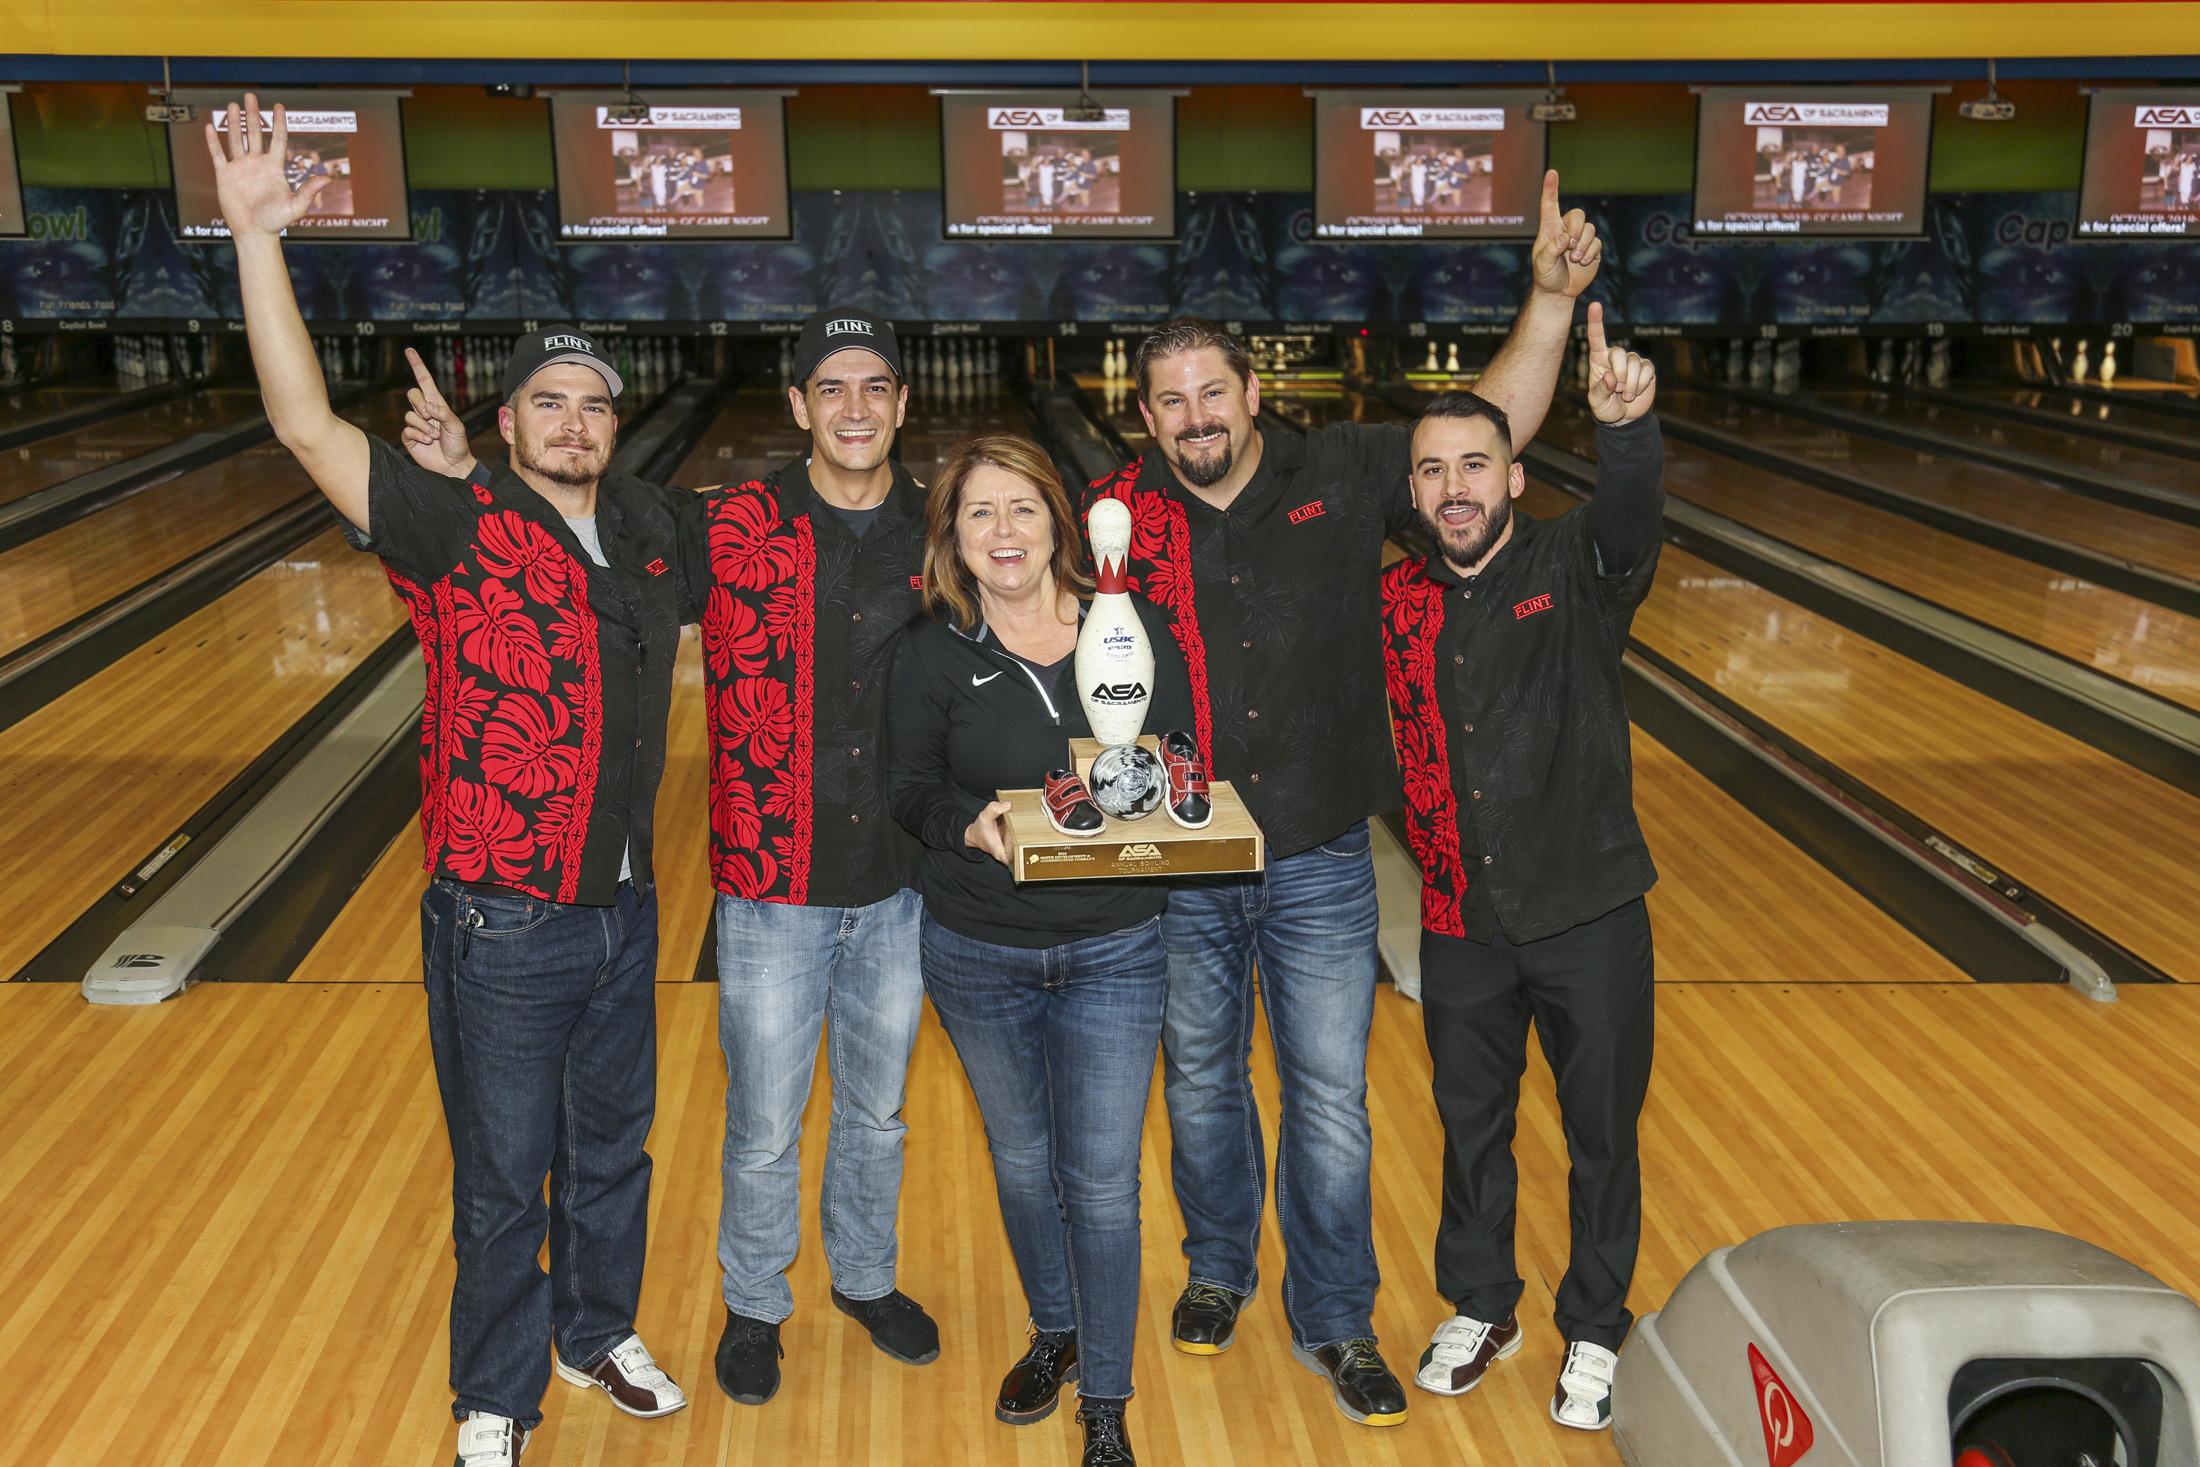 61_ASA Bowling Tourney 2019